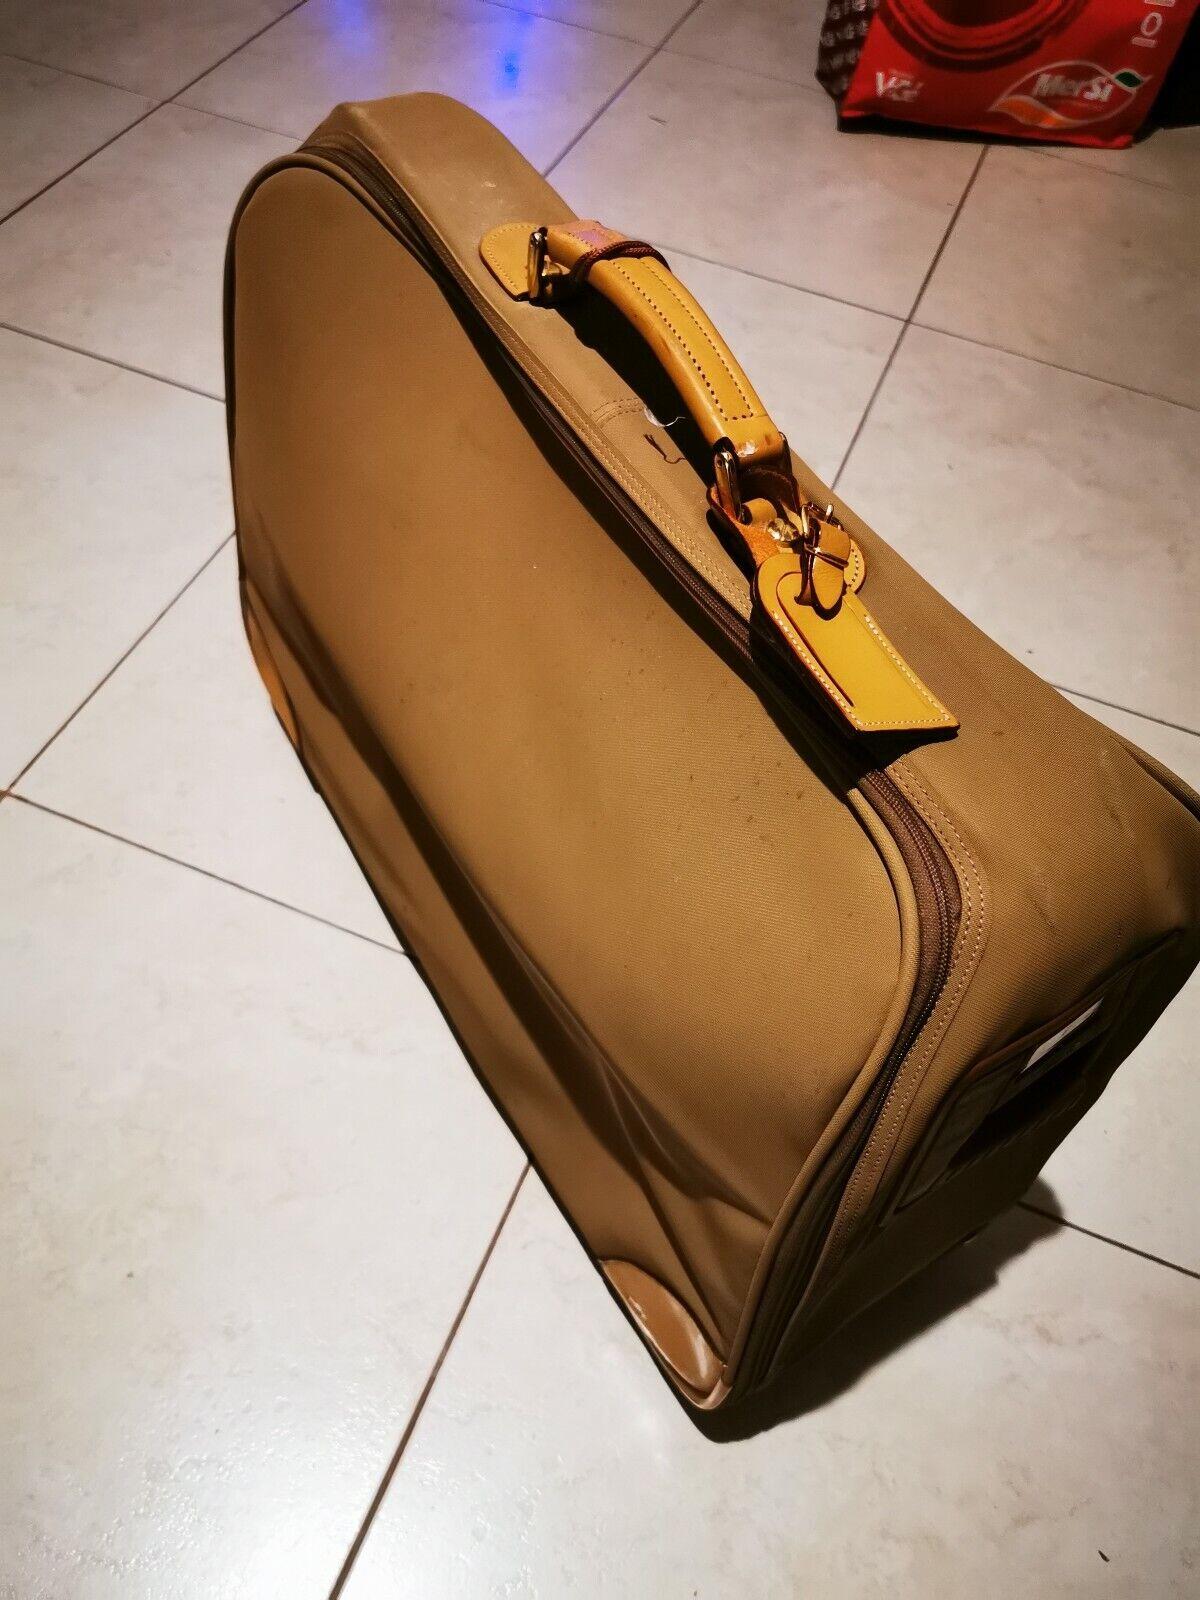 Valigia Brics fondo di magazzino nuova 67 X 48 vintage